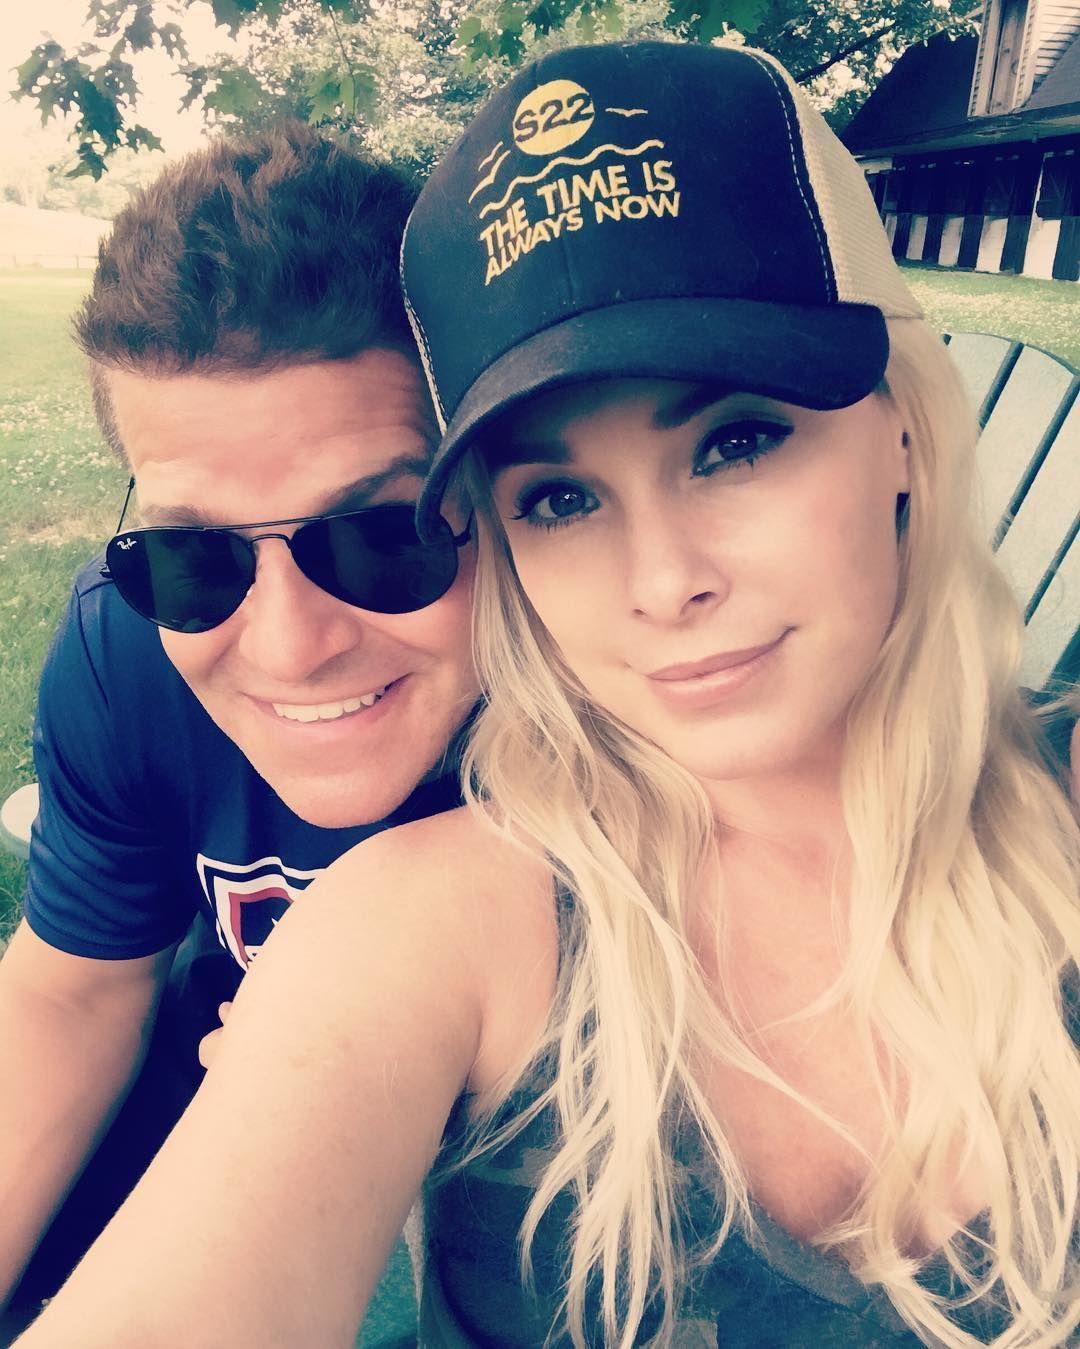 David Boreanaz with Family in Philadephia | Baseball hats ...